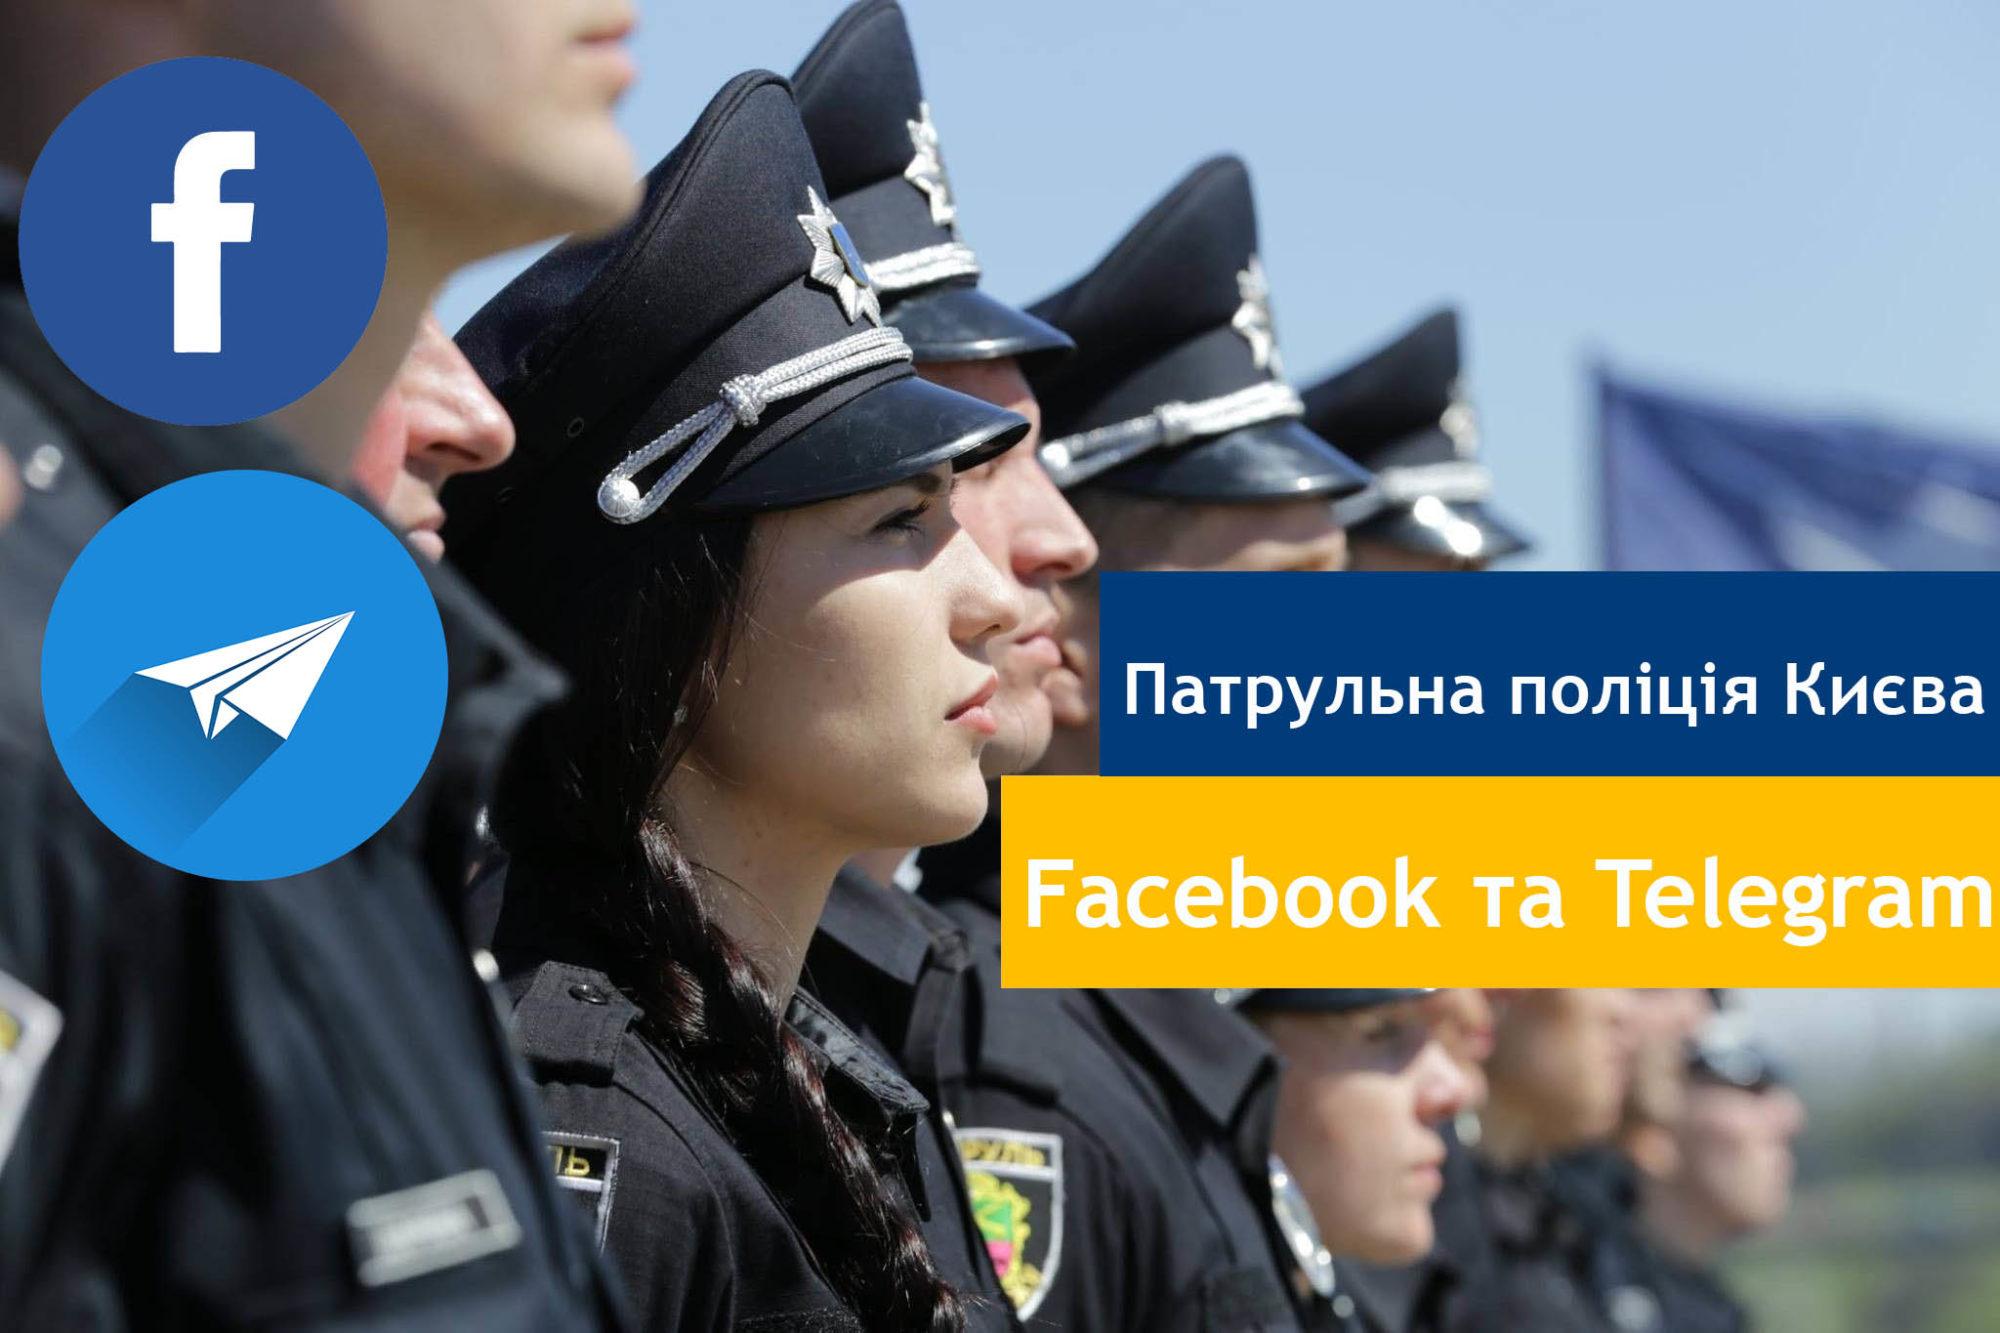 Патрульна поліція Києва запустила власний Telegram канал - патруль, Telegram - patrul 2000x1333